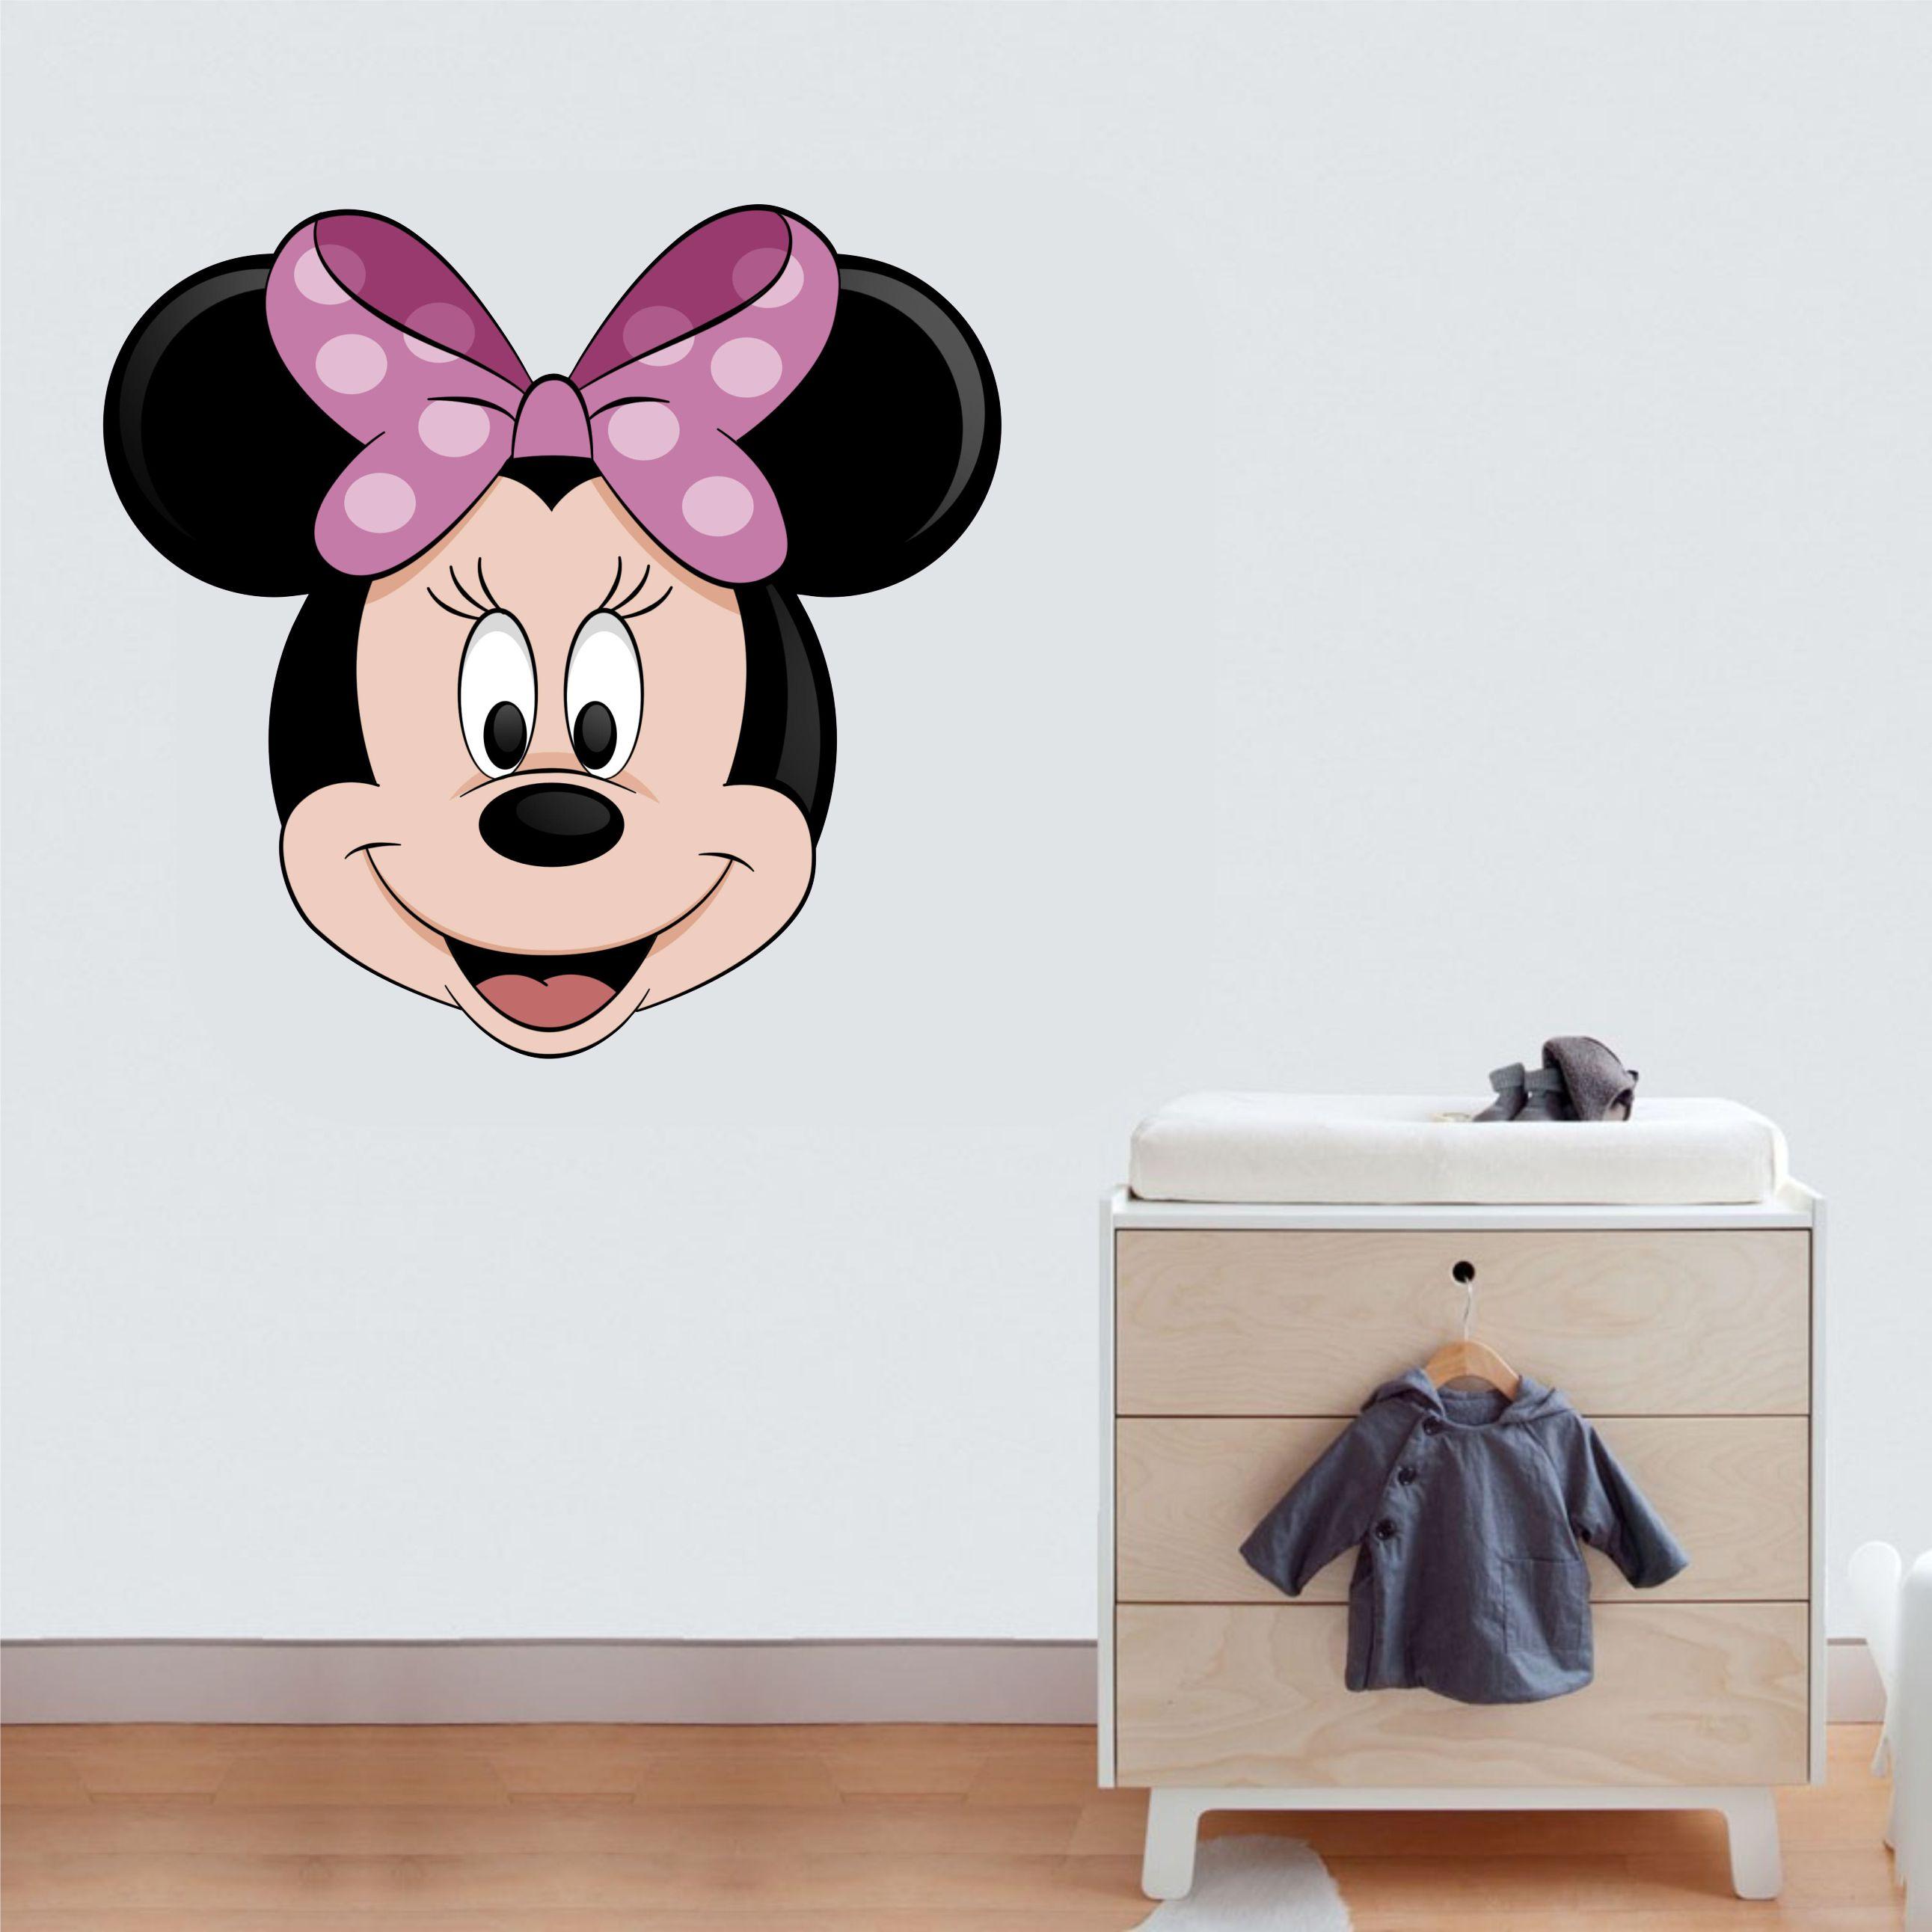 Papel De Parede Adesivo Herois ~ Adesivo Parede Minnie Mouse Desenho Inove Brindes Elo7